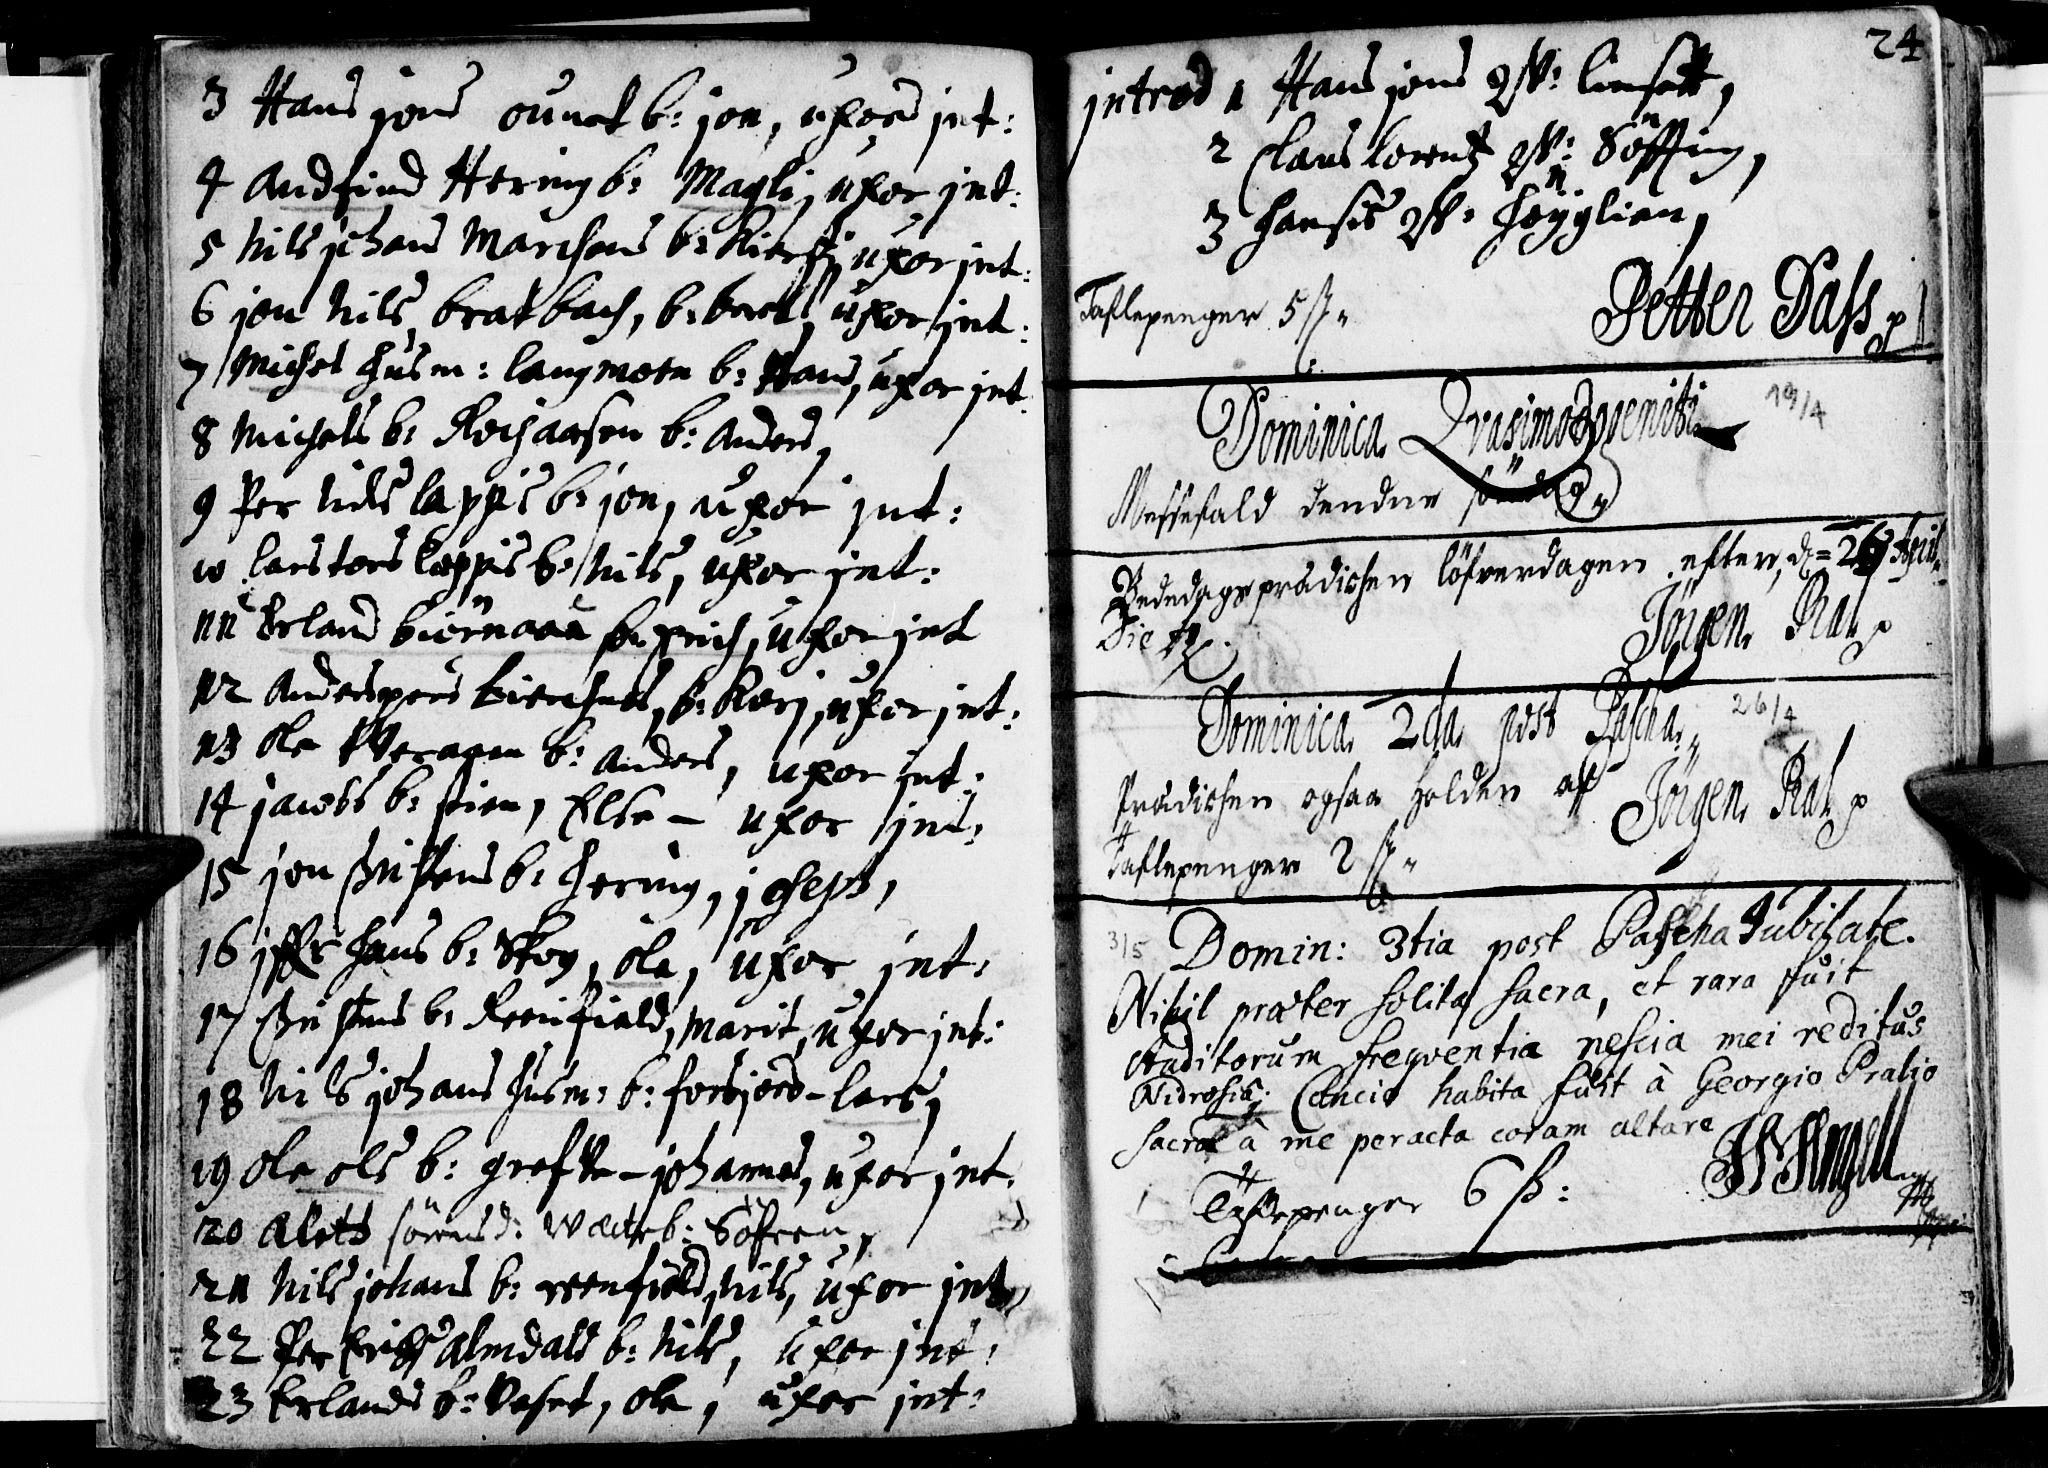 SAT, Ministerialprotokoller, klokkerbøker og fødselsregistre - Nordland, 820/L0280: Ministerialbok nr. 820A01, 1690-1693, s. 24